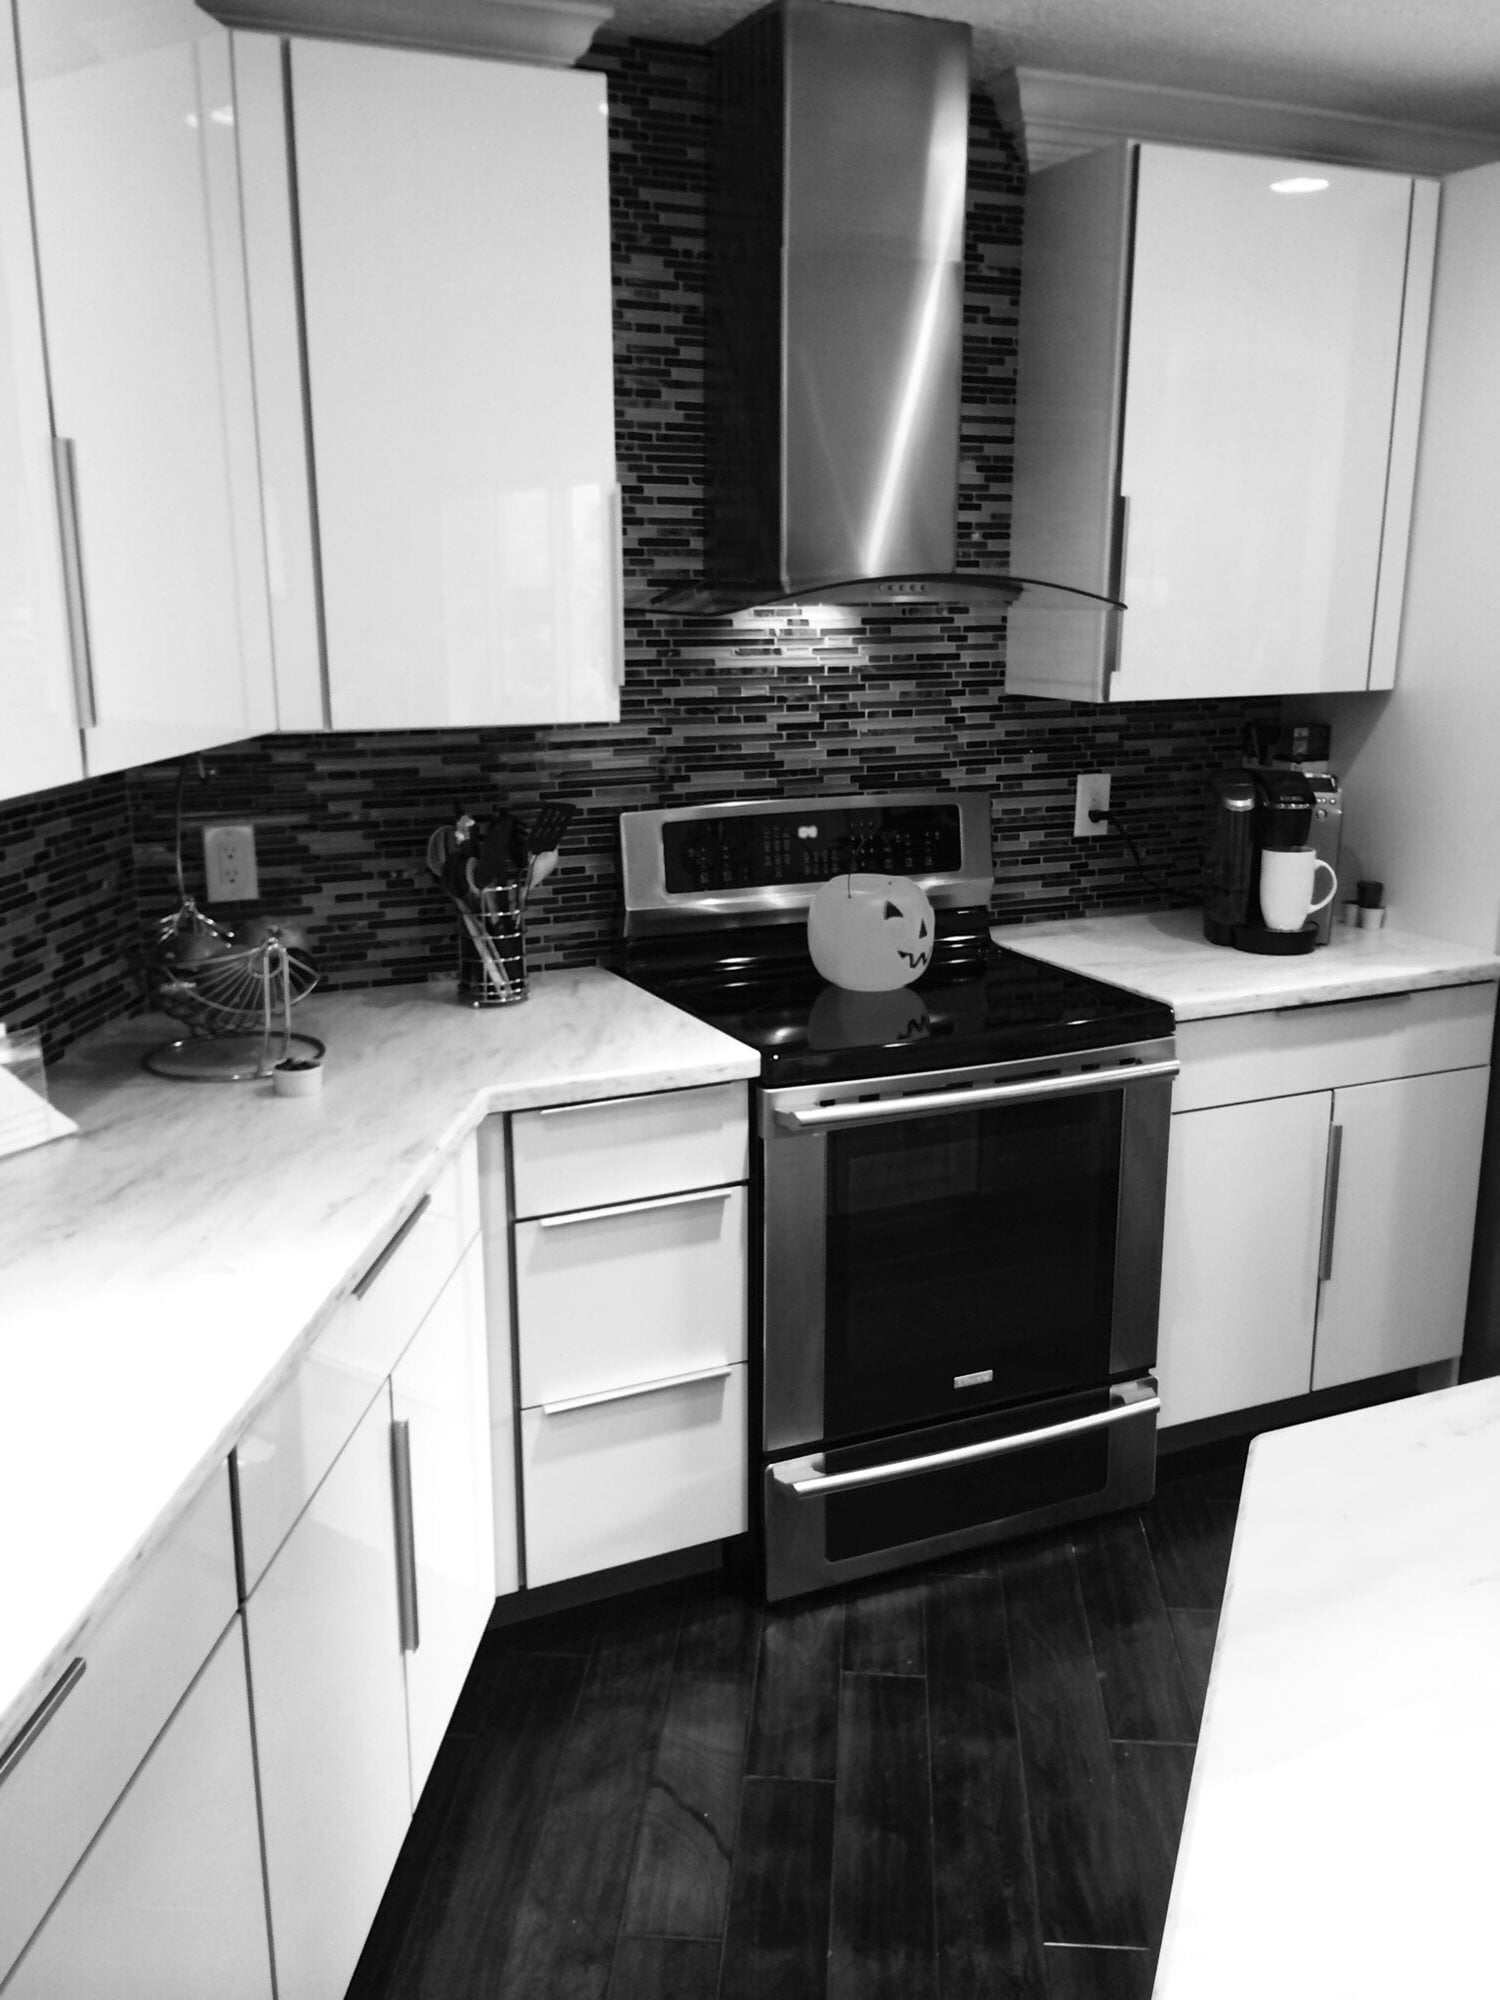 Gorgeous monochrome kitchen design in Palm Beach Gardens, FL from Floors For You Kitchen & Bath